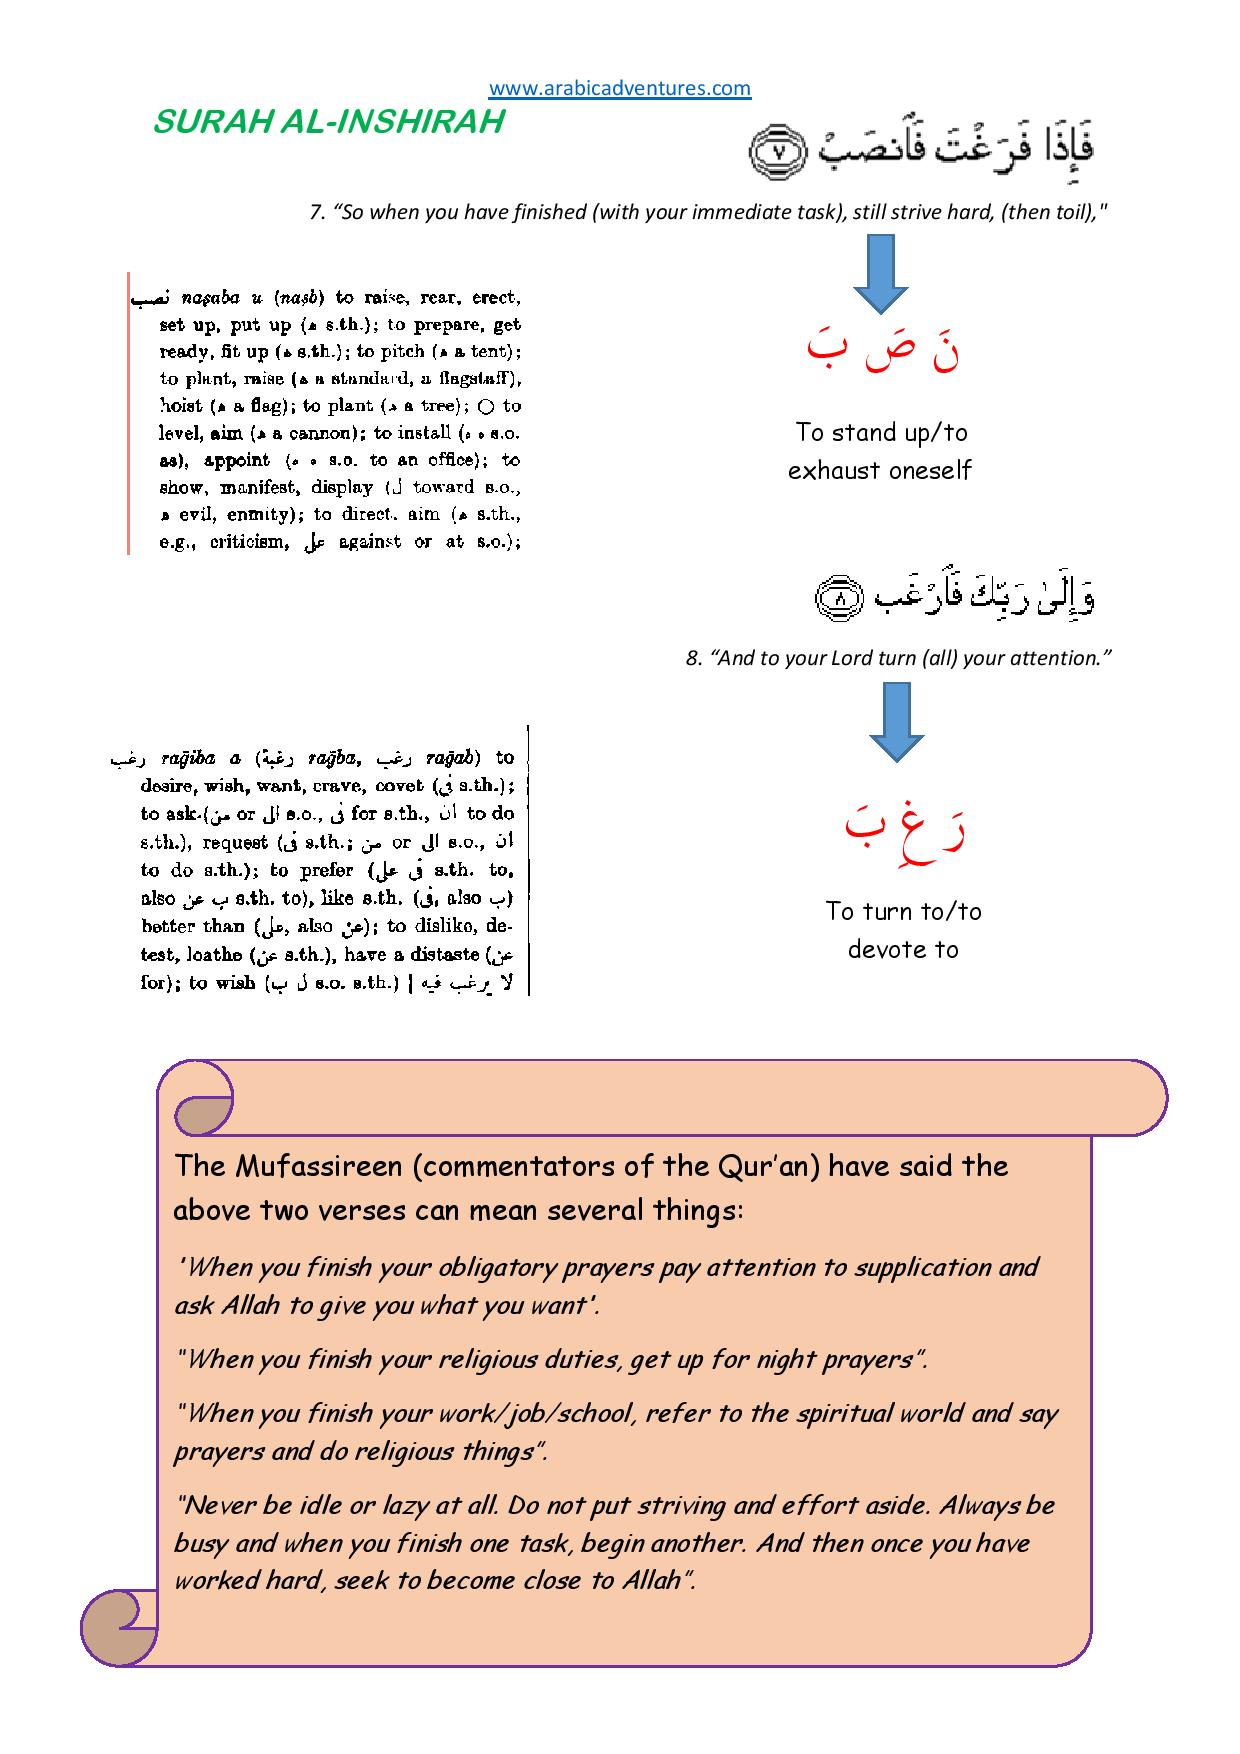 Surah Al Inshirah Tafsir Handout